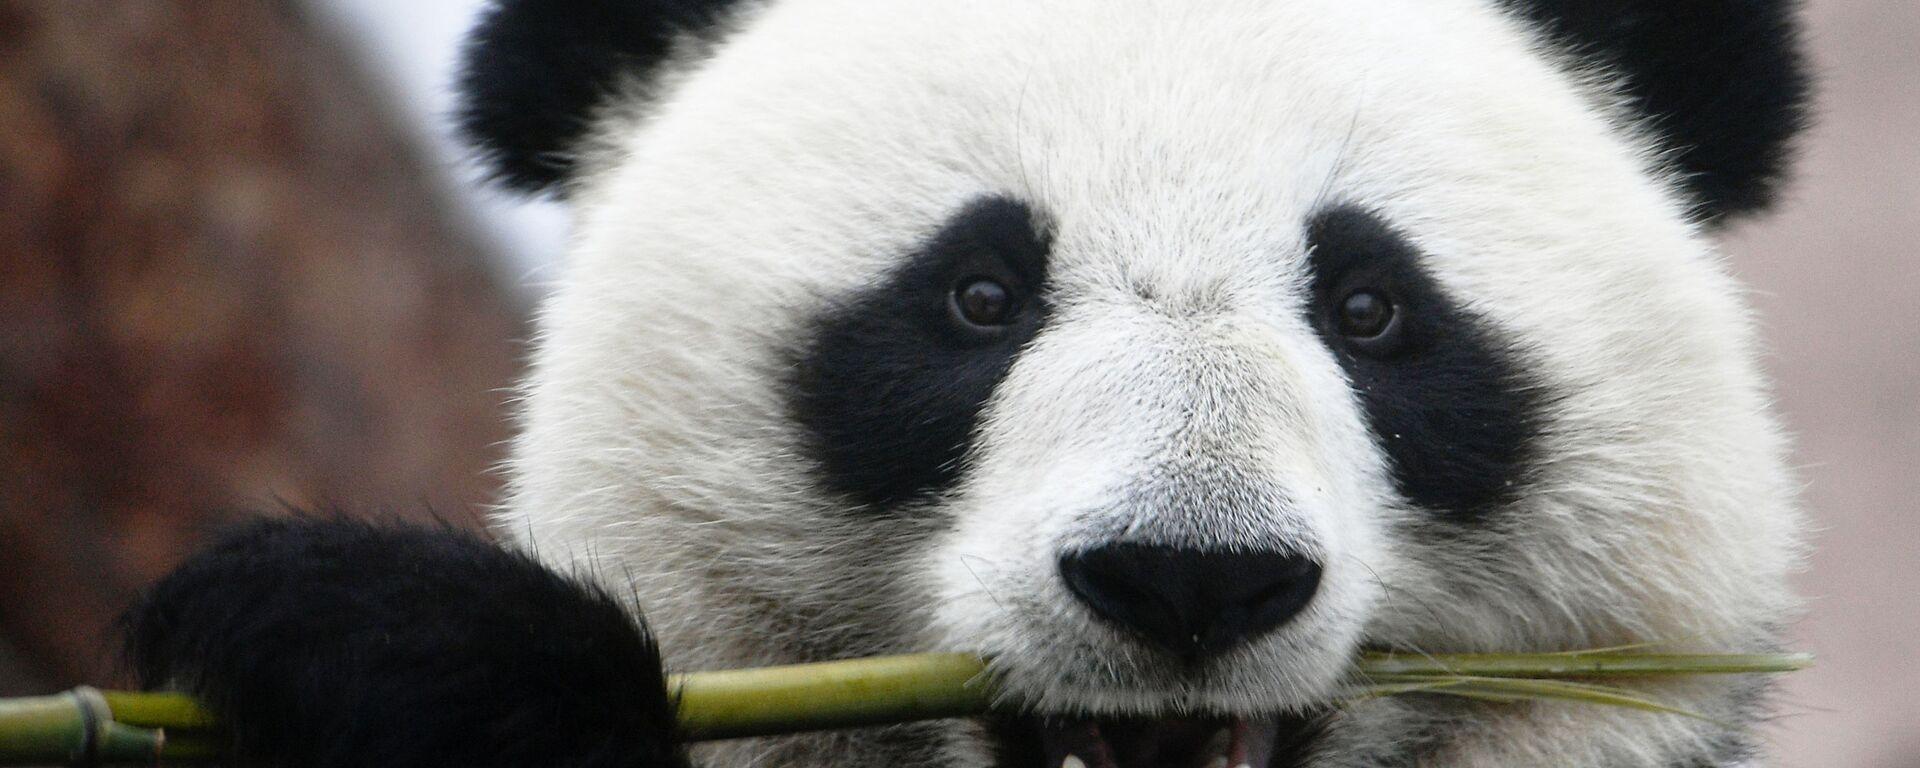 Un panda de un zoológico ruso - Sputnik Mundo, 1920, 09.07.2021